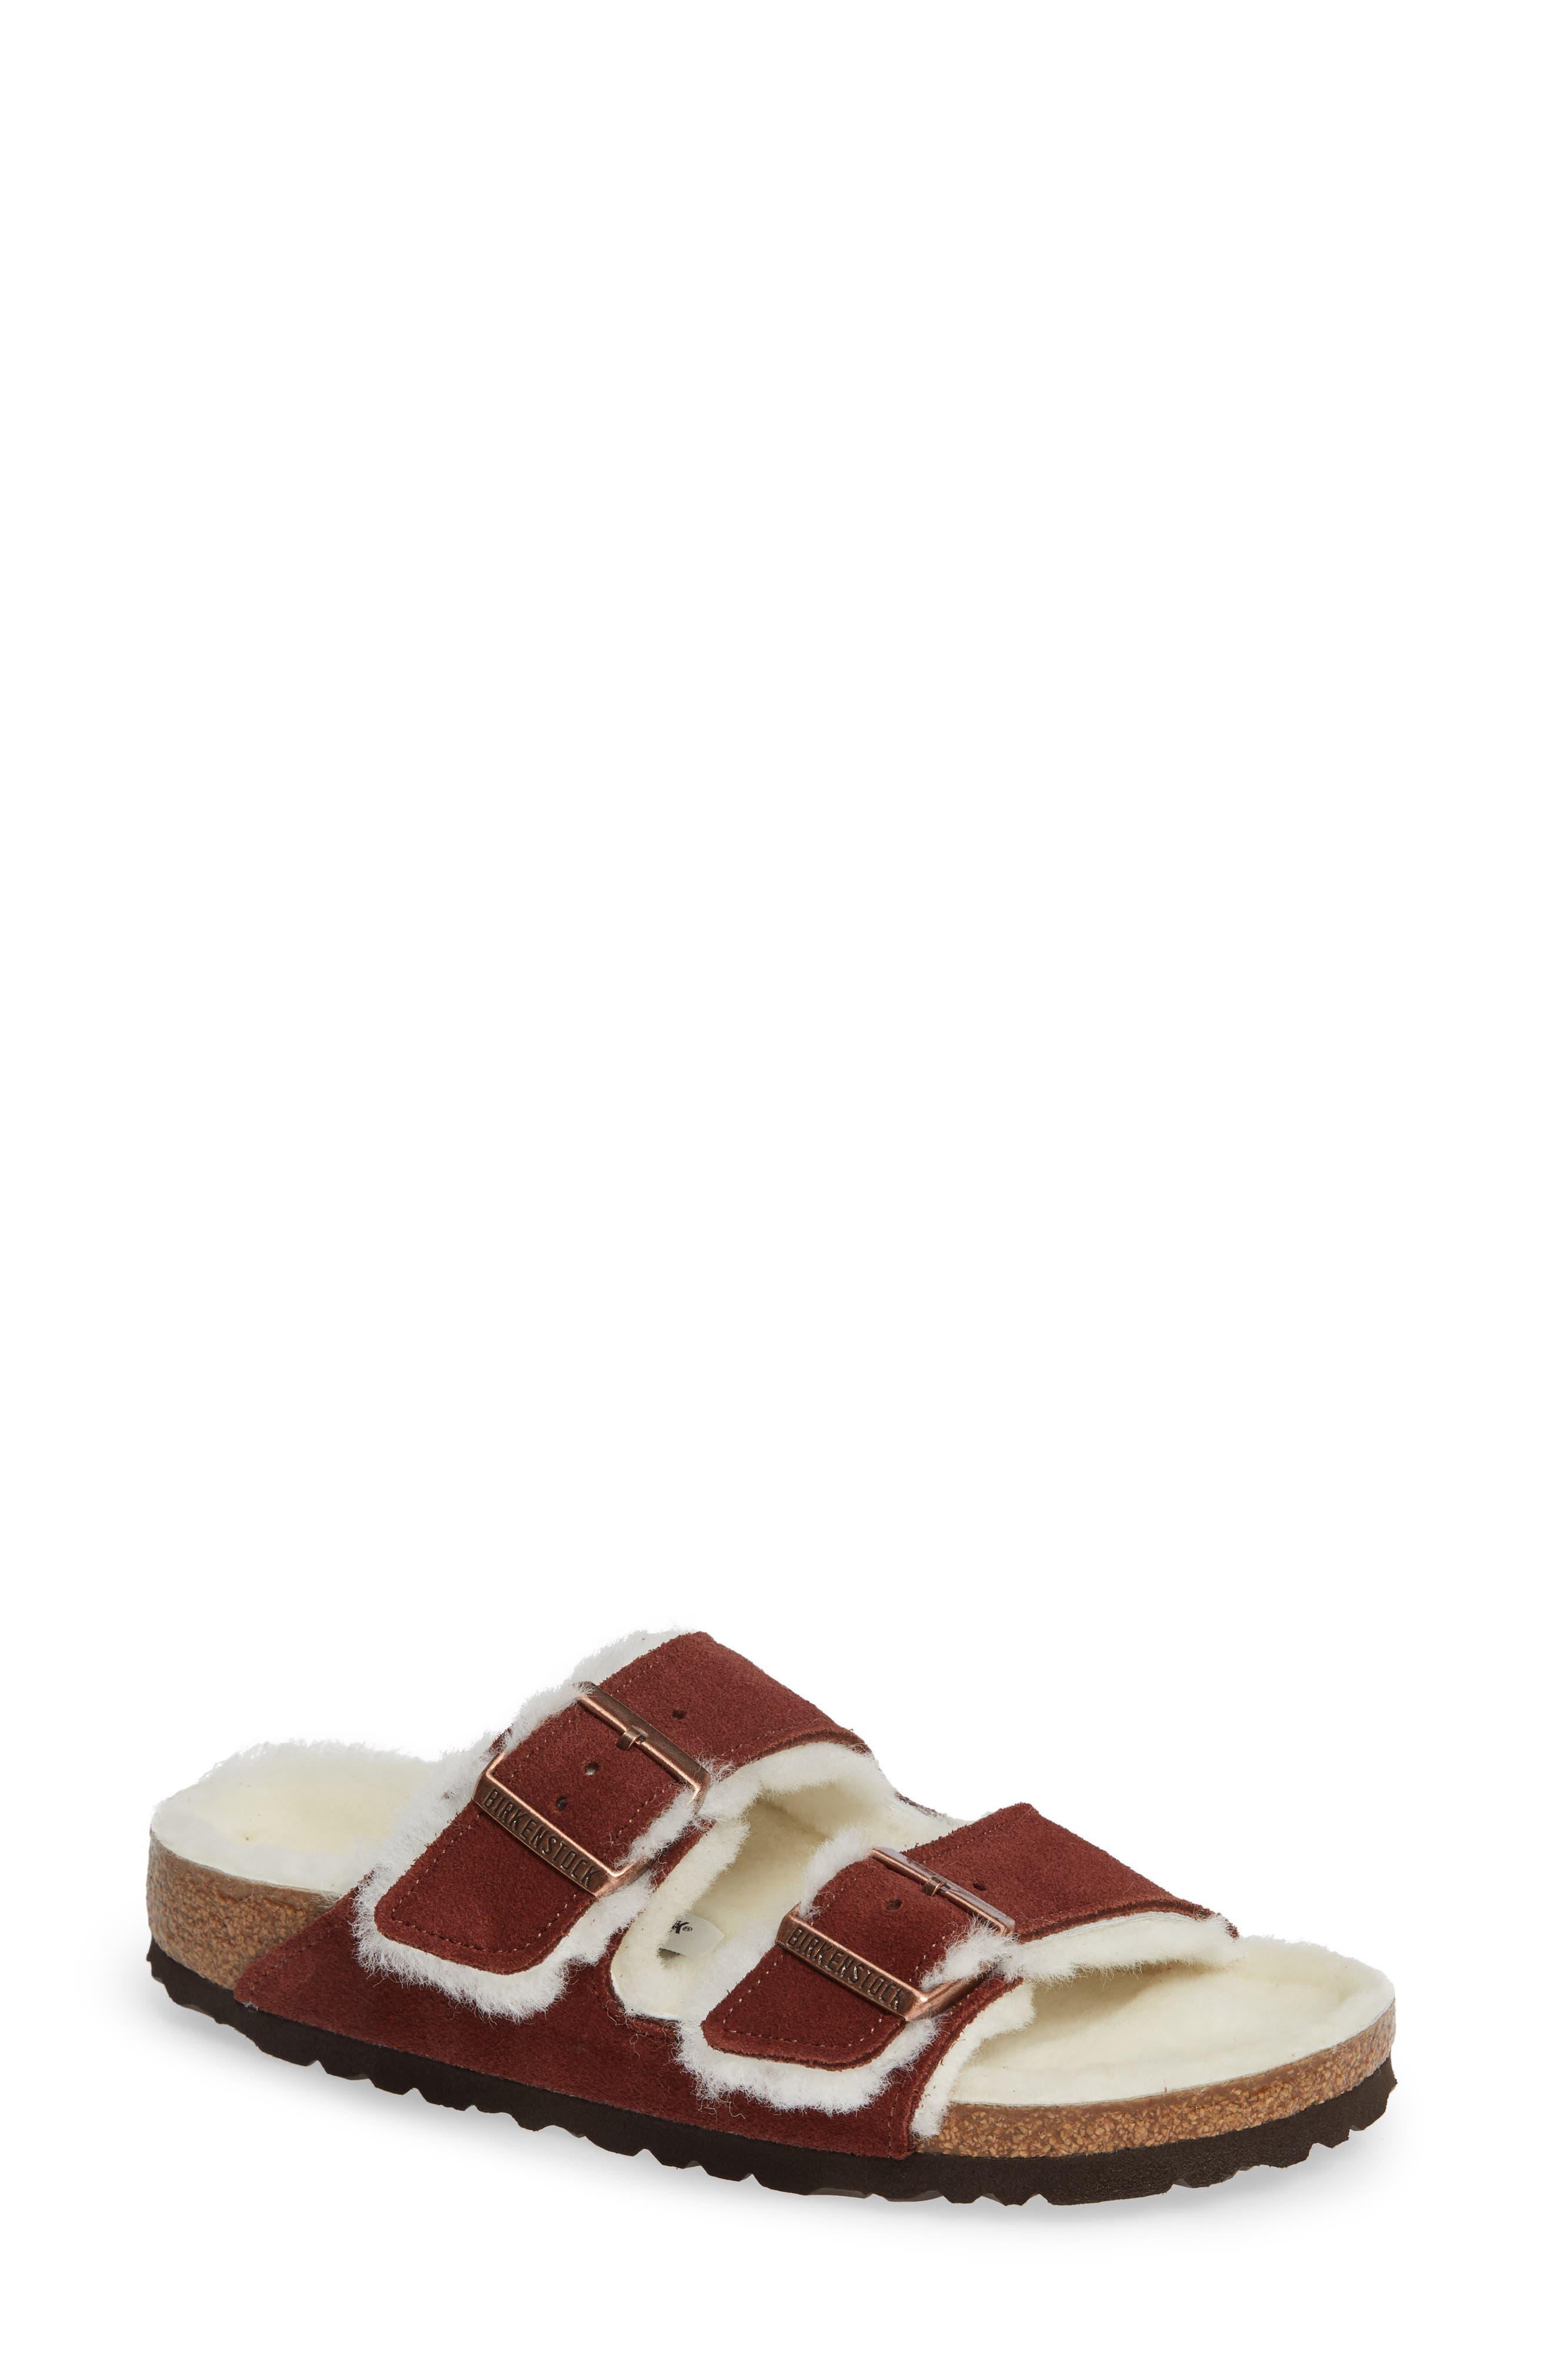 'Arizona' Genuine Shearling Lined Sandal,                         Main,                         color, PORT SUEDE